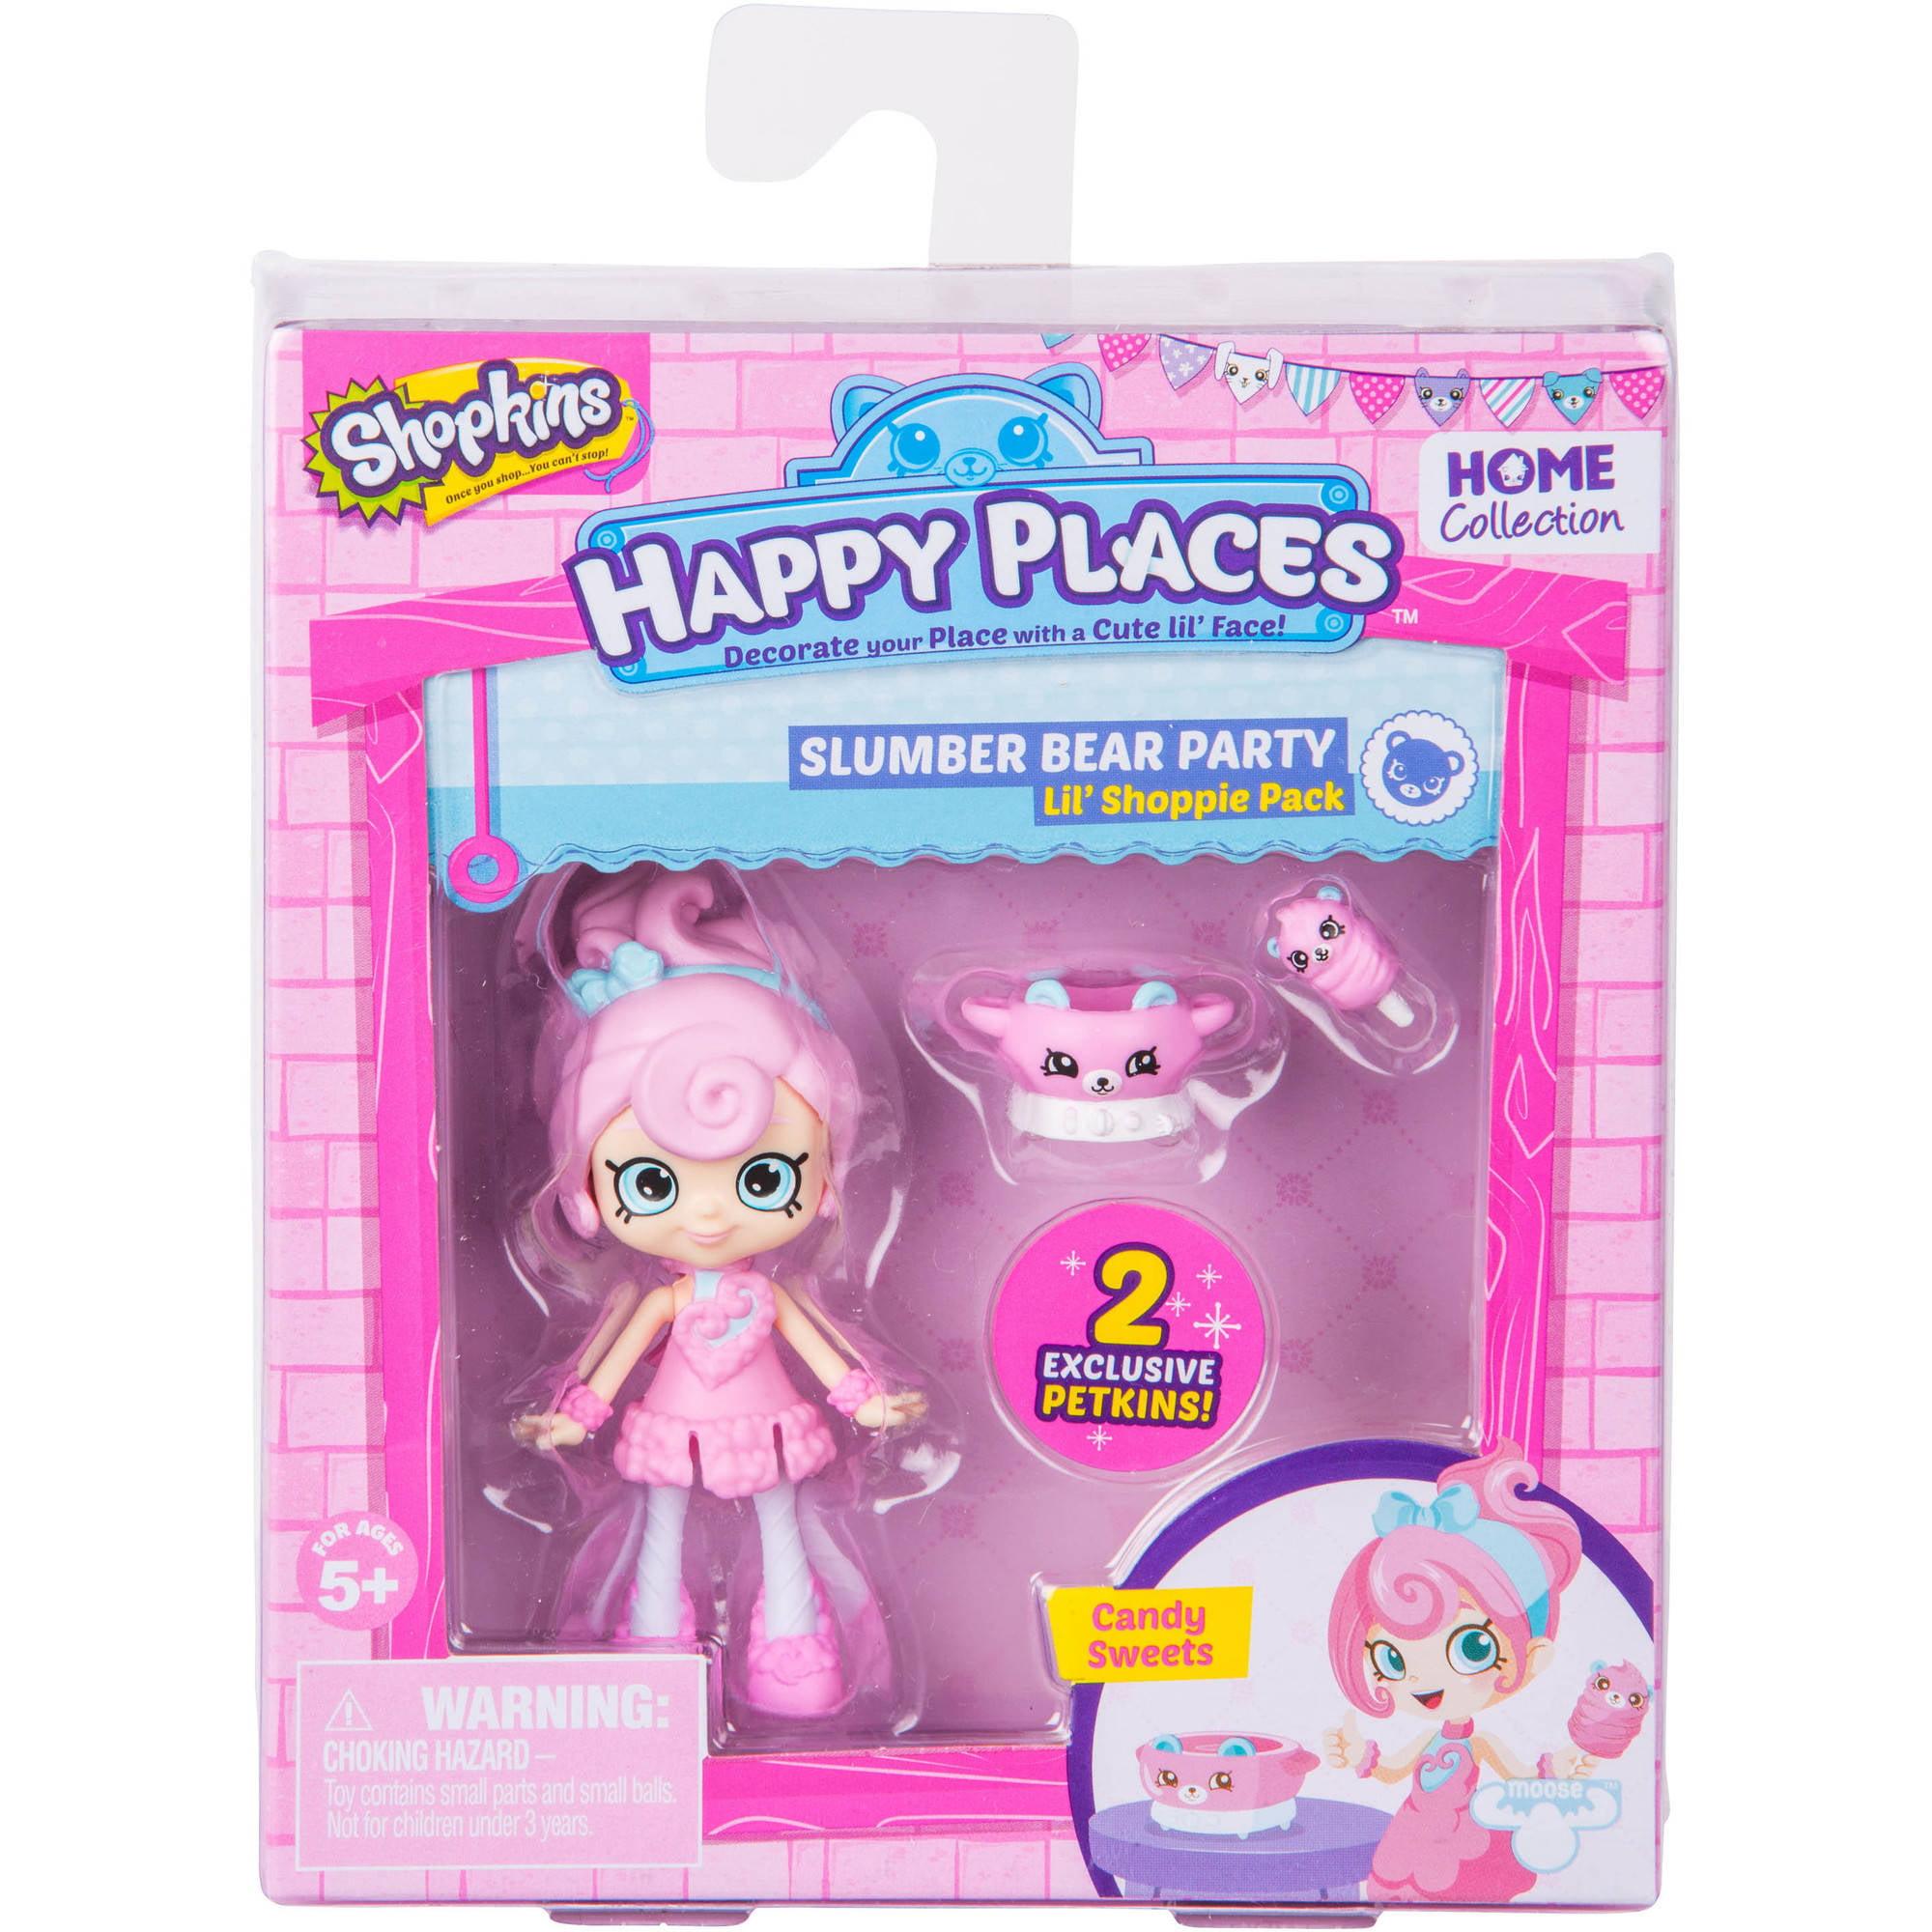 Happy Places Shopkins S2 Doll, Cotton Sweets